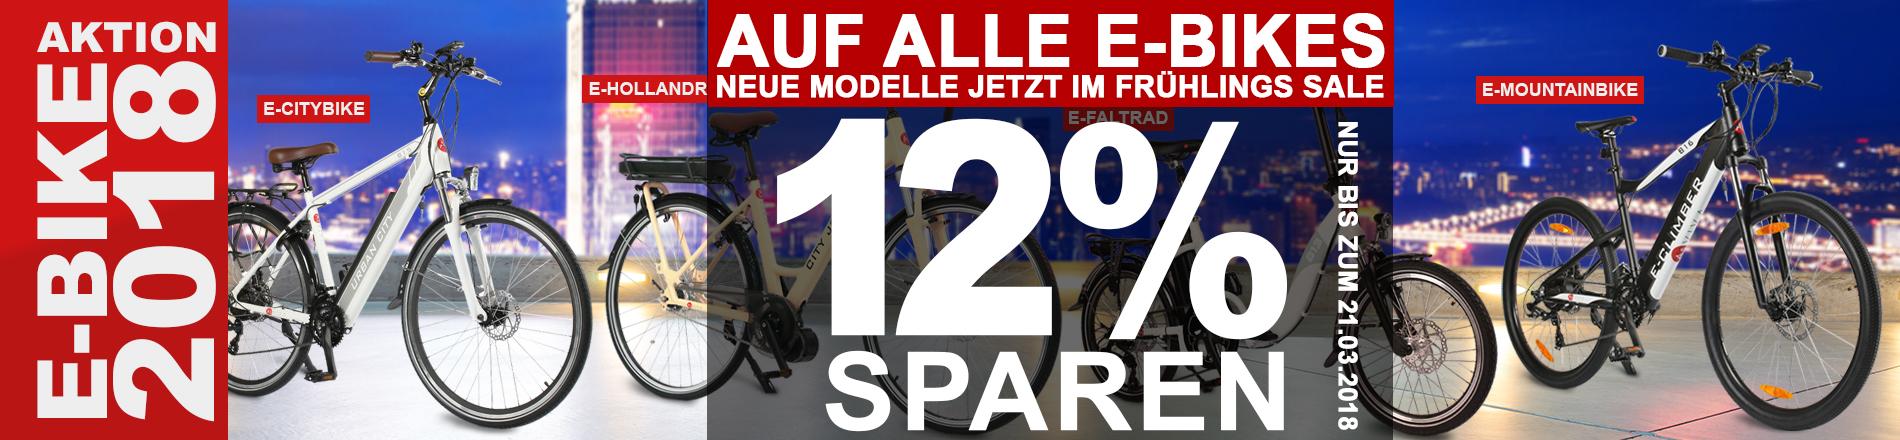 E-BIKE Top Angebot - Frühlingsrabatt 12%